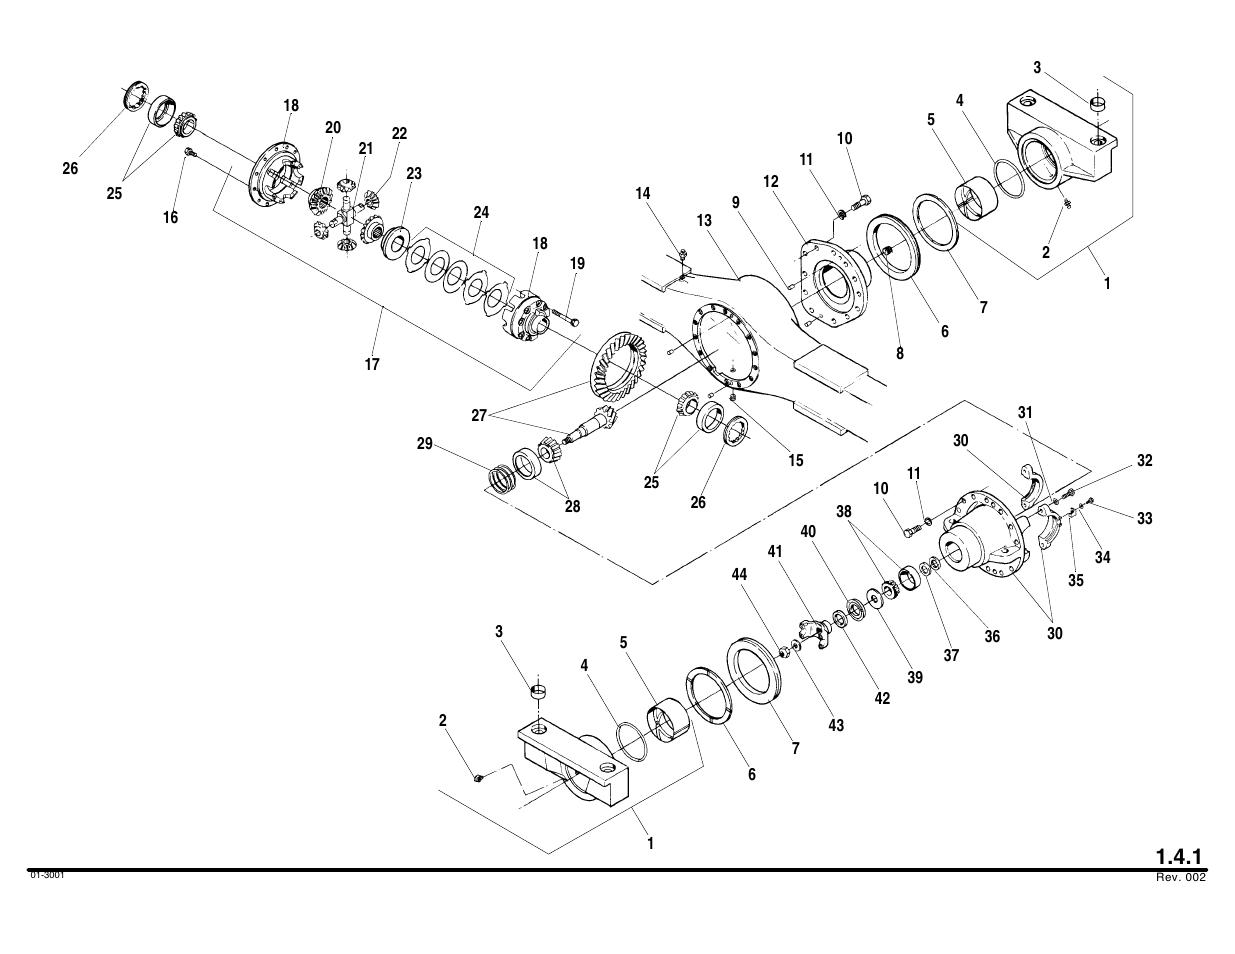 Lull 644b Parts Manual User Manual